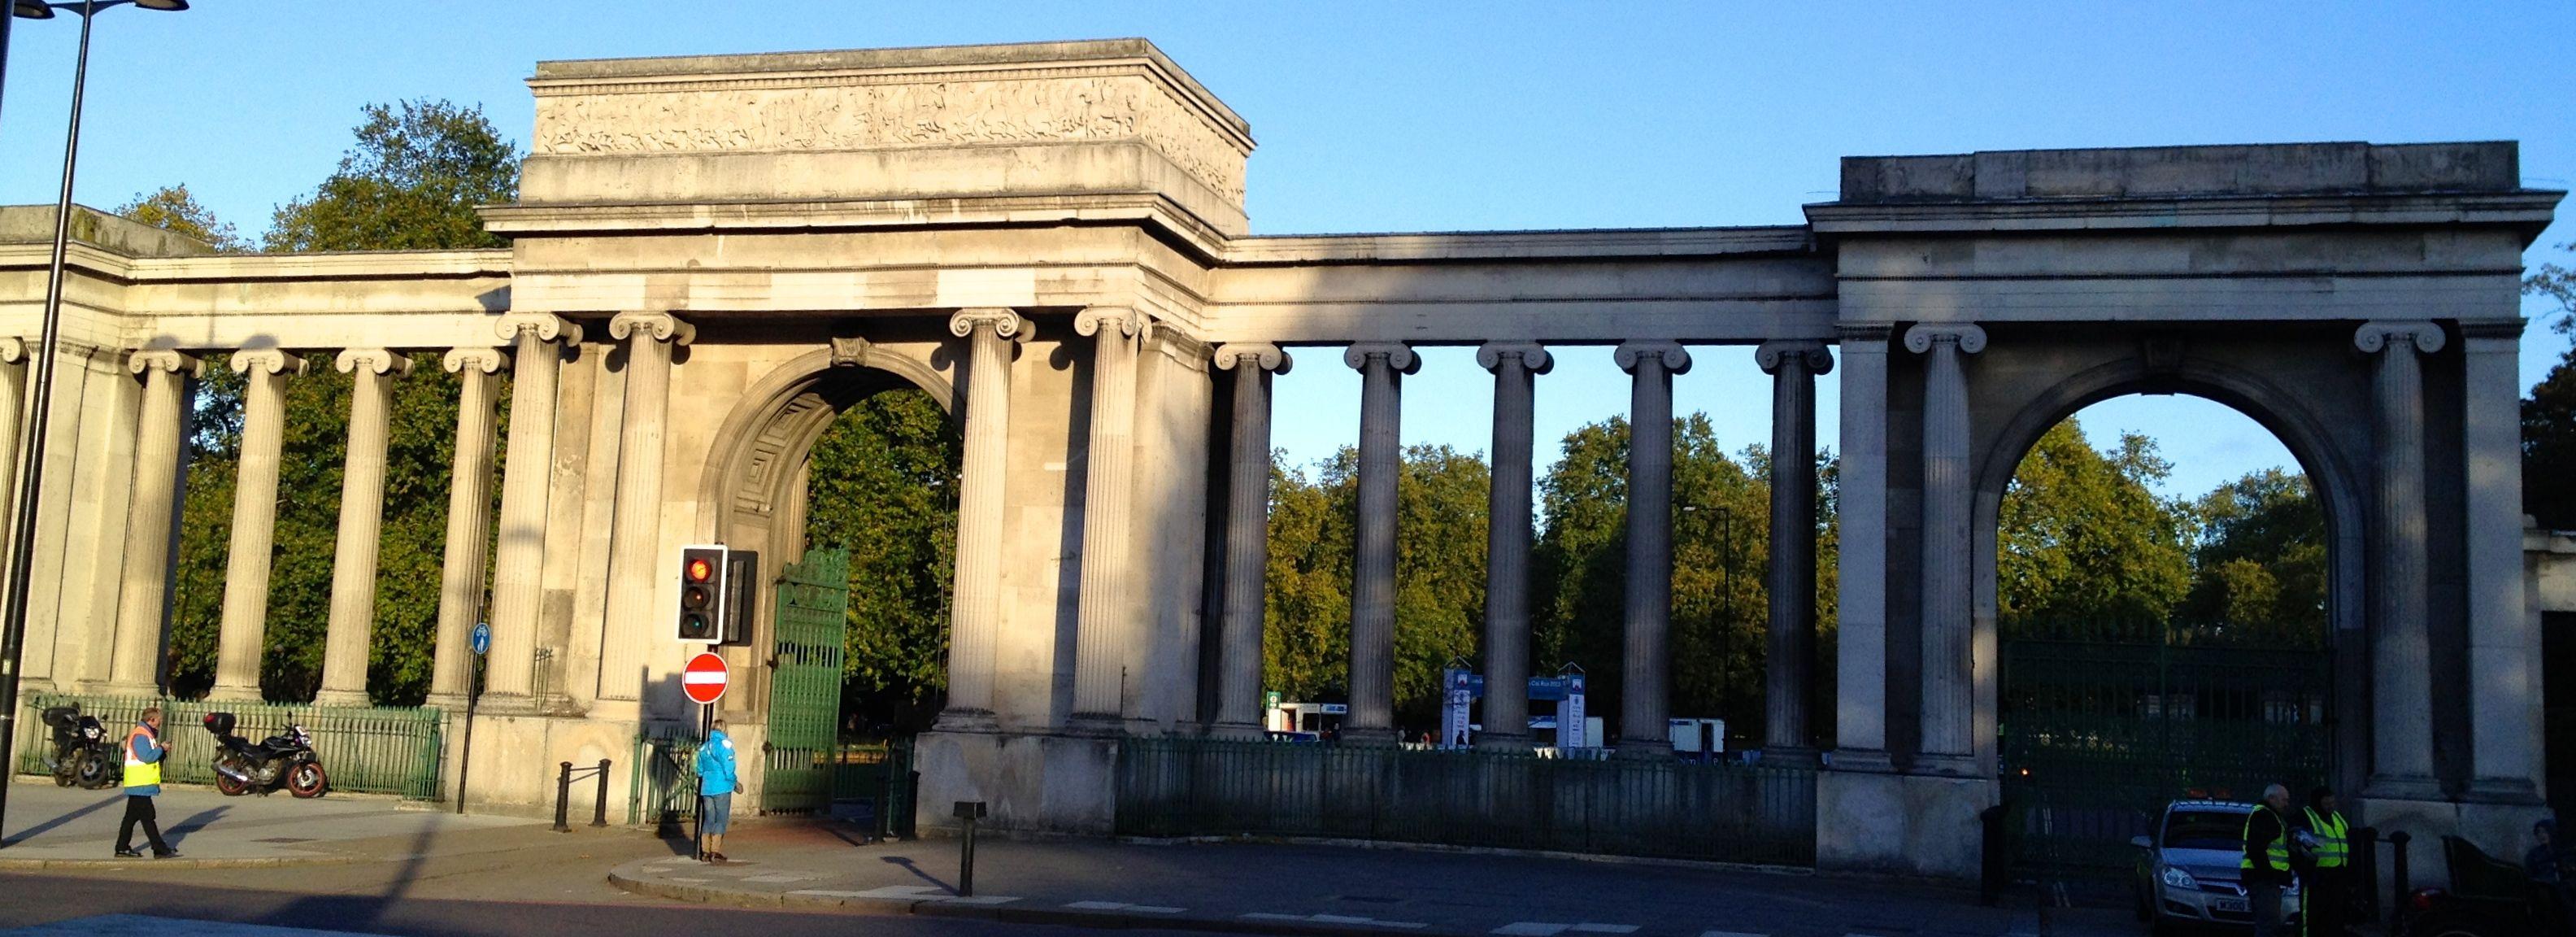 Hyde Park Corner Entry Gate